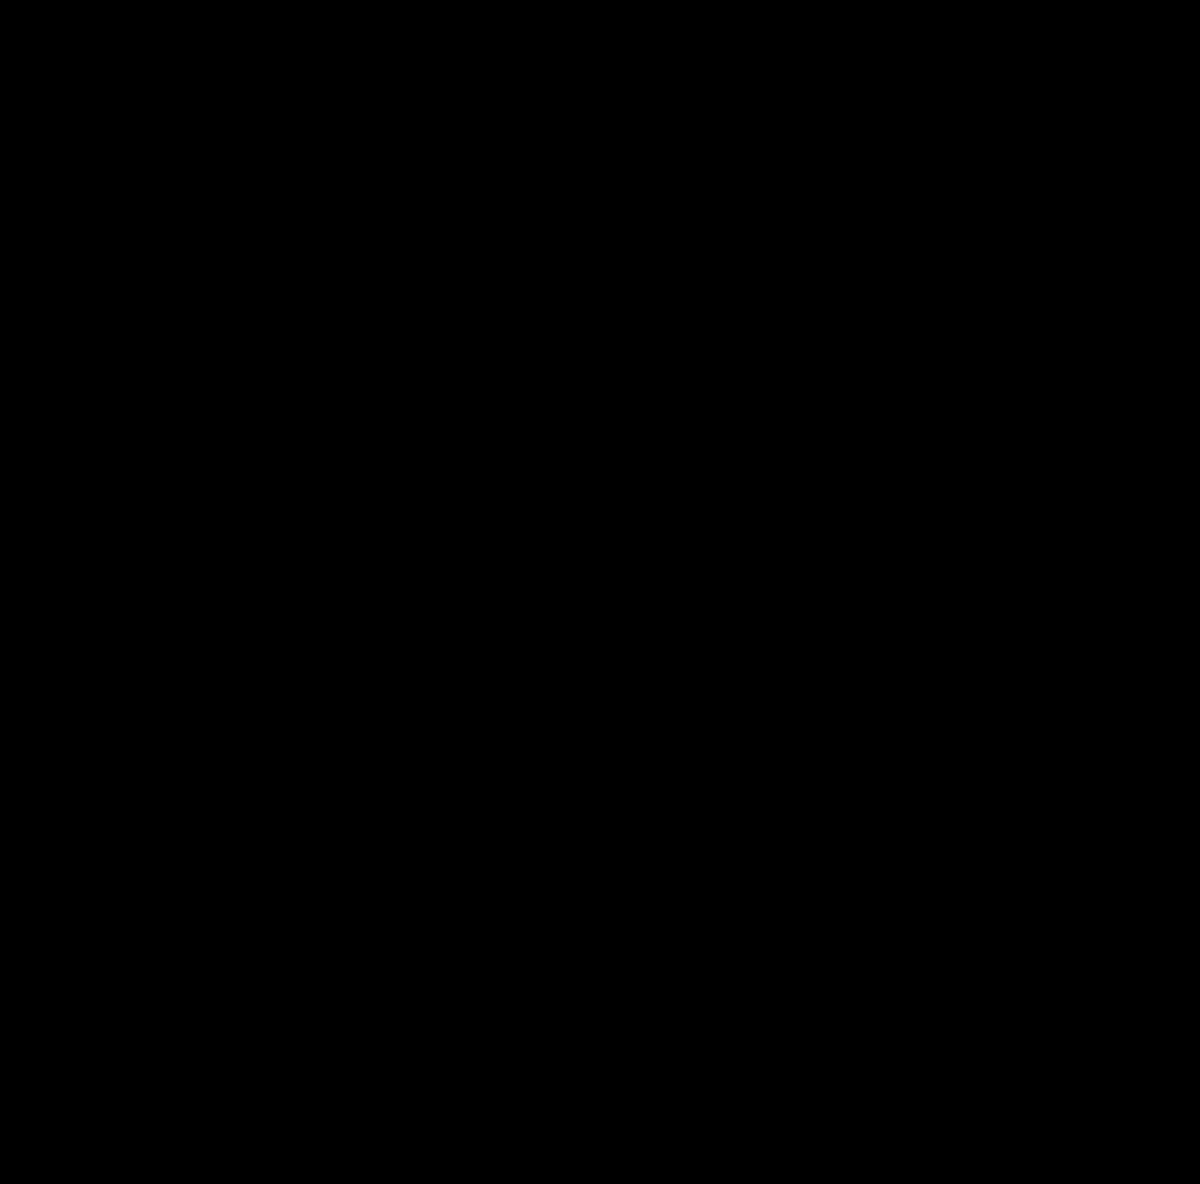 Geheime Kluis in Klok – Klokkluis – Safe Wall Clock